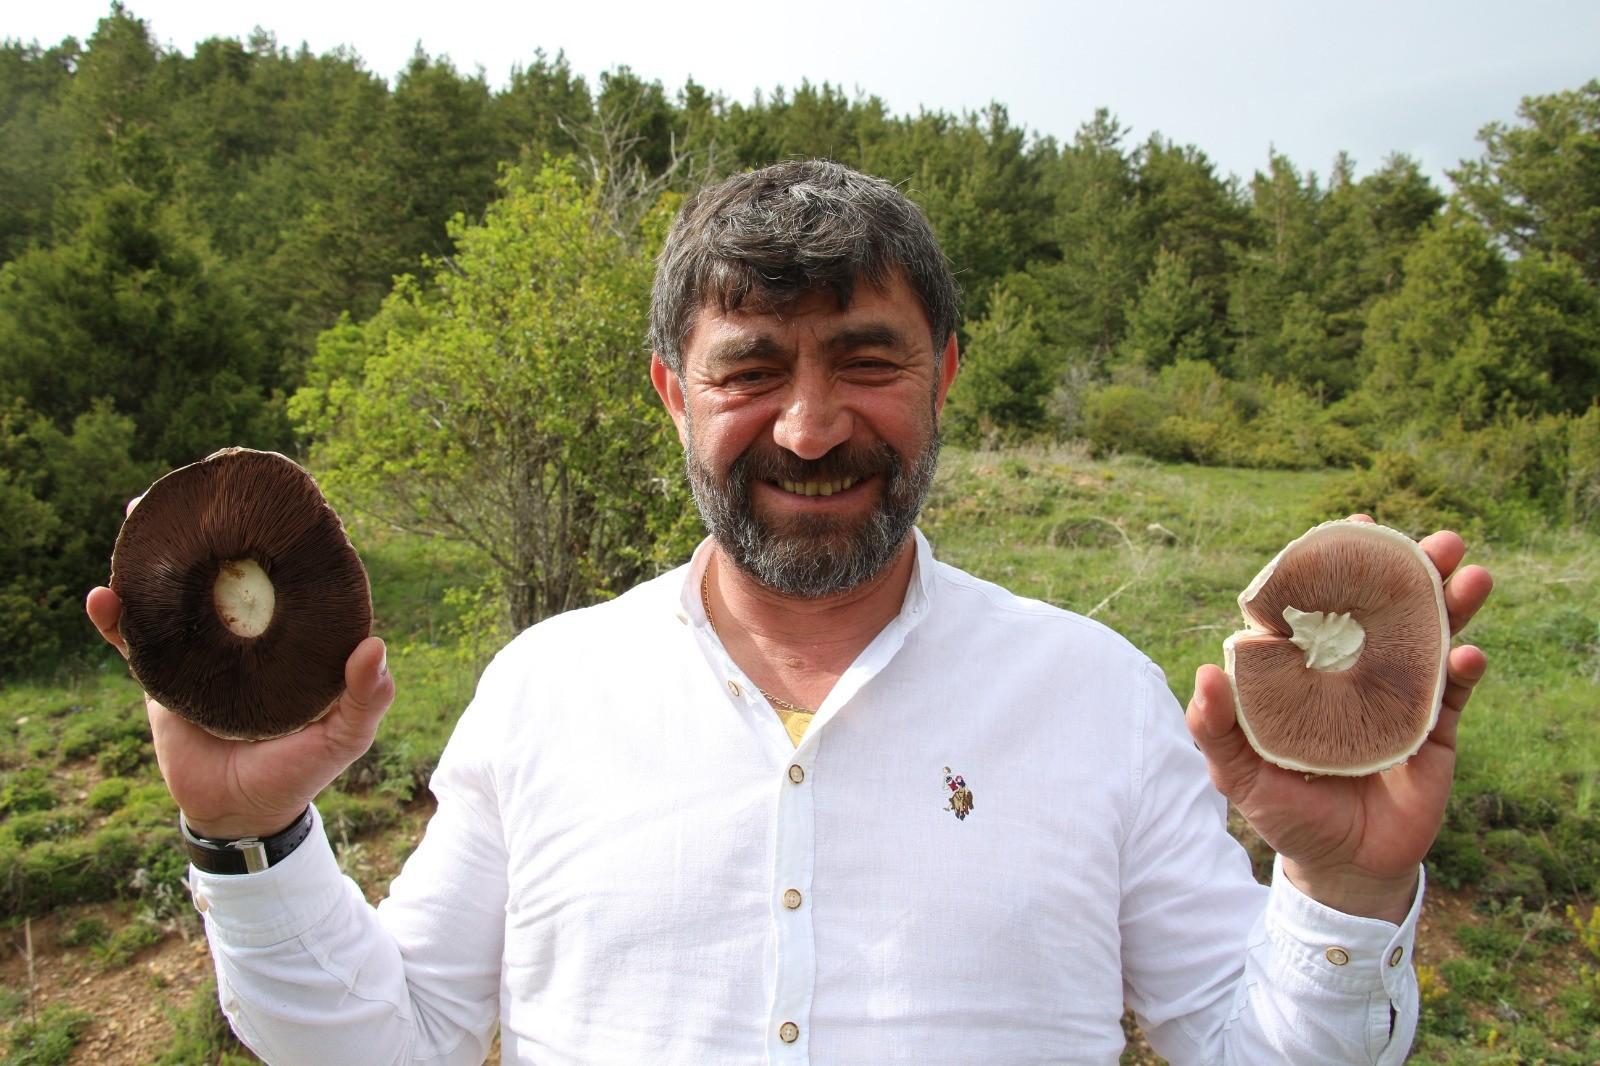 Erzurum'da Kasa kasa mantar topladılar